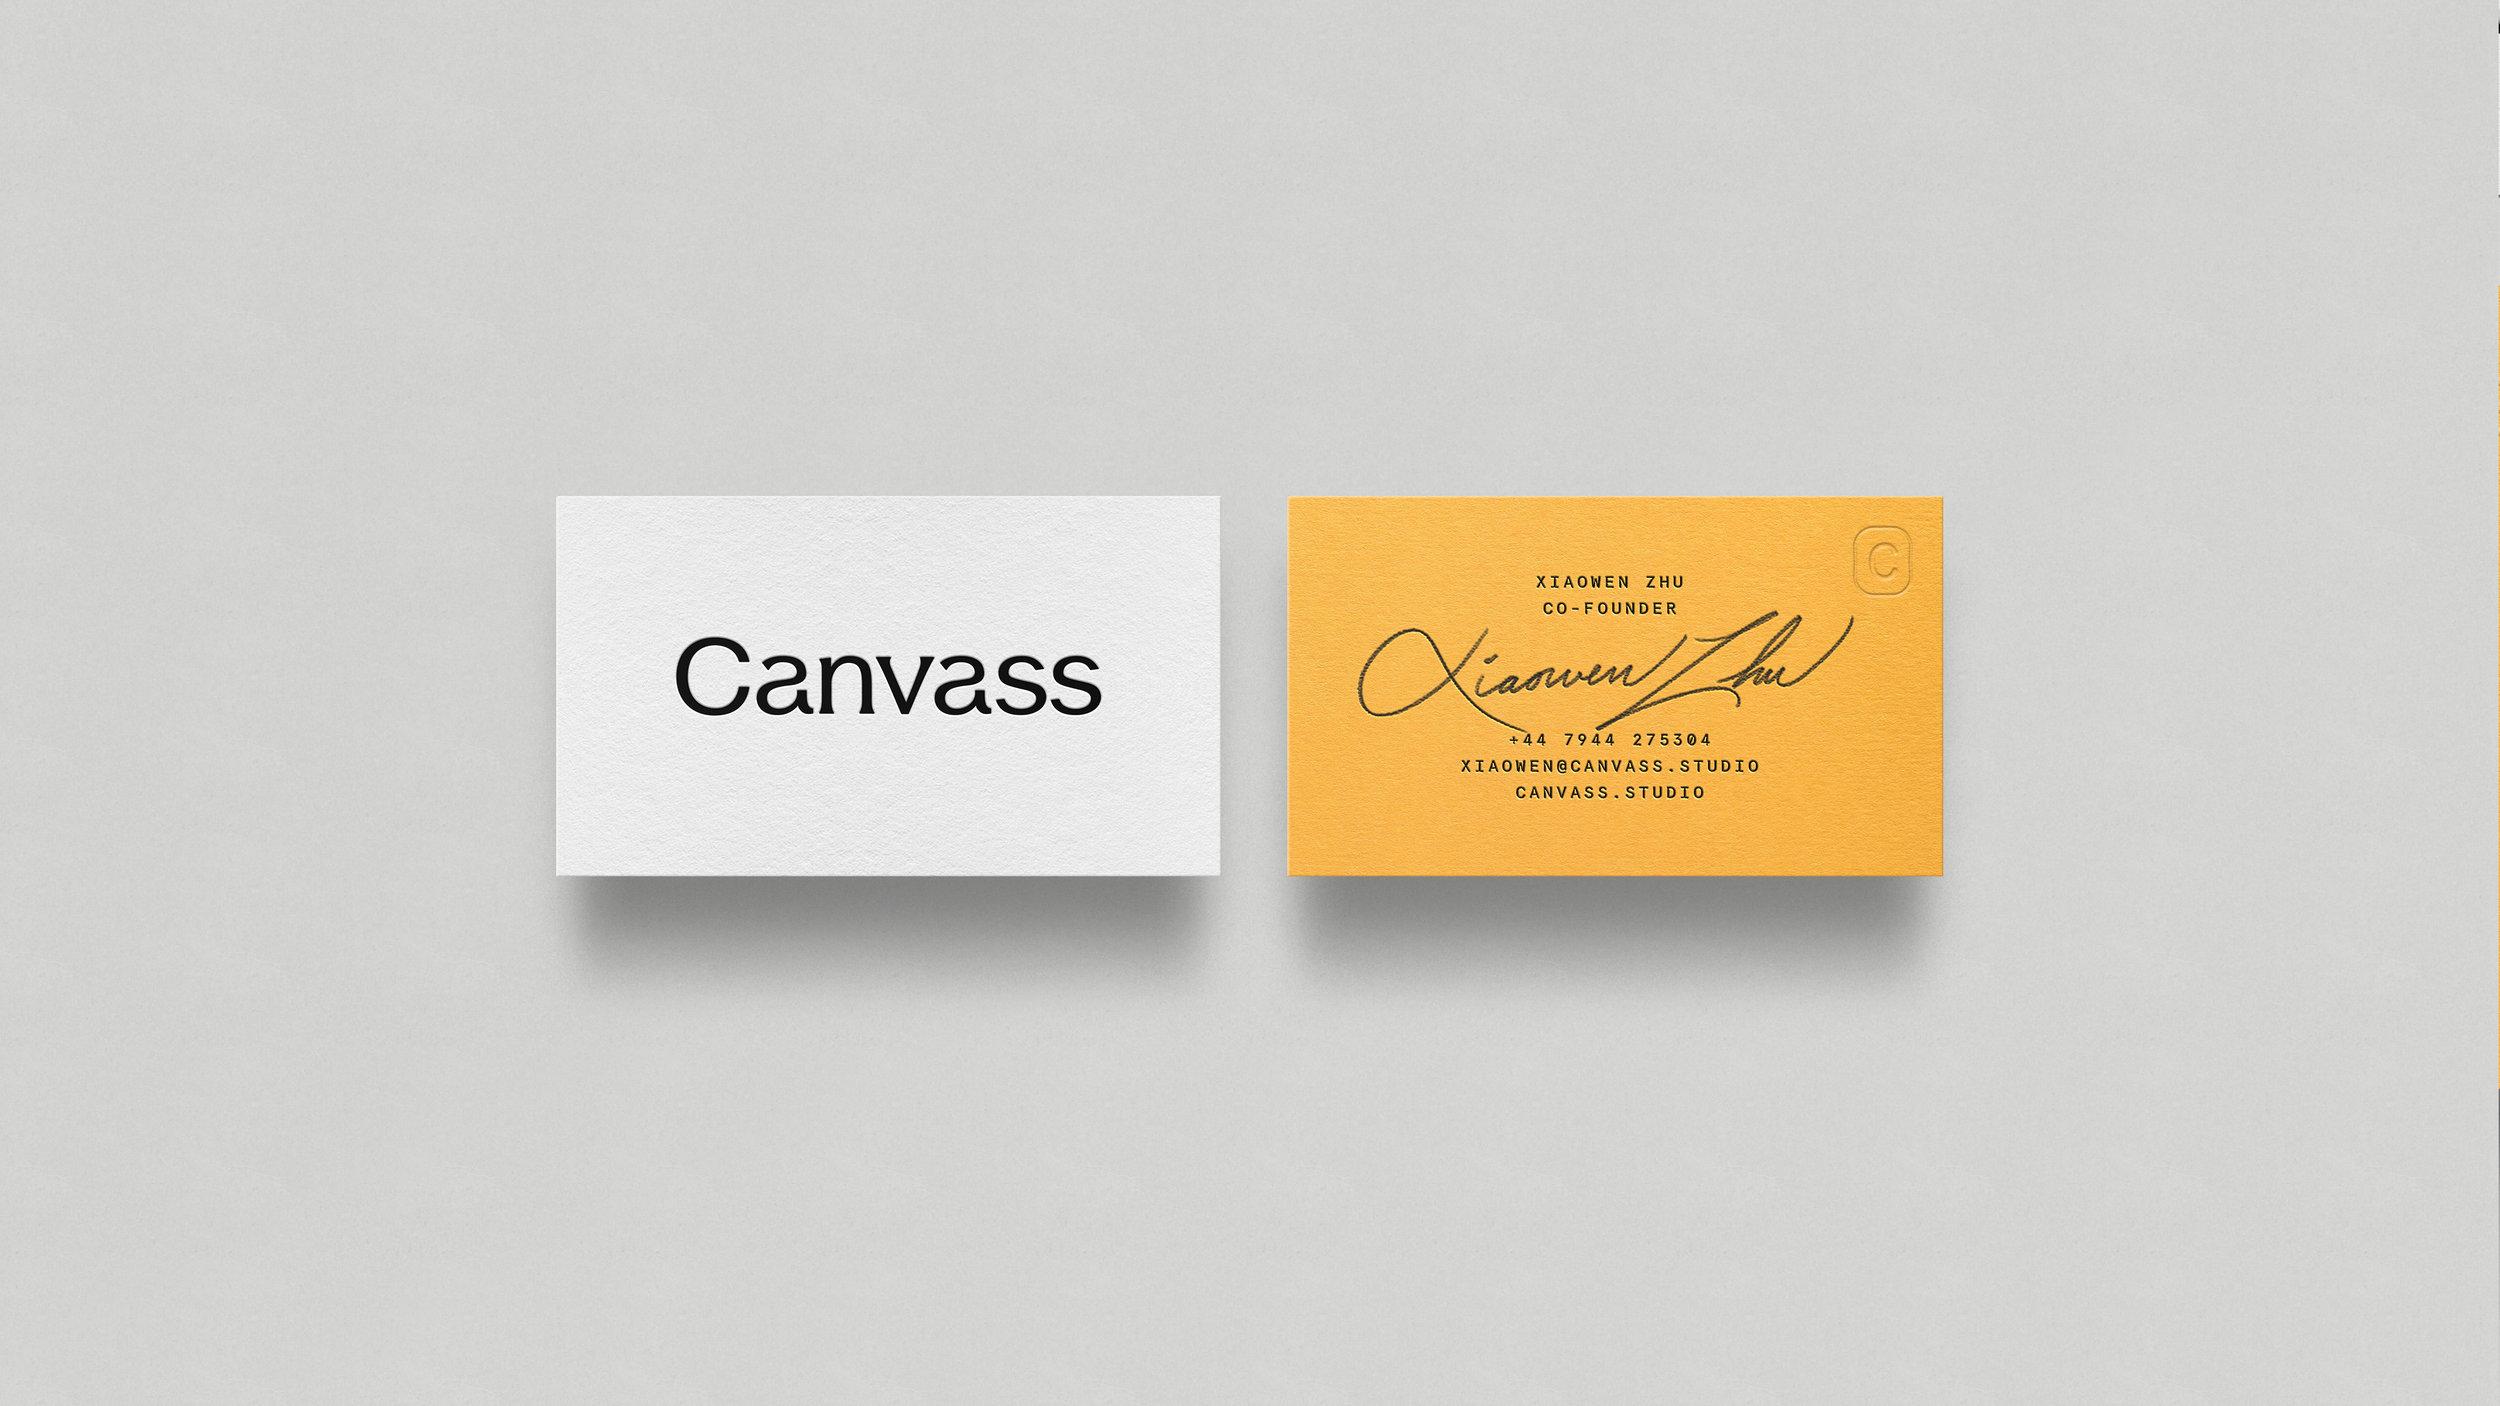 Canvass_WhiteBKG_2.jpg